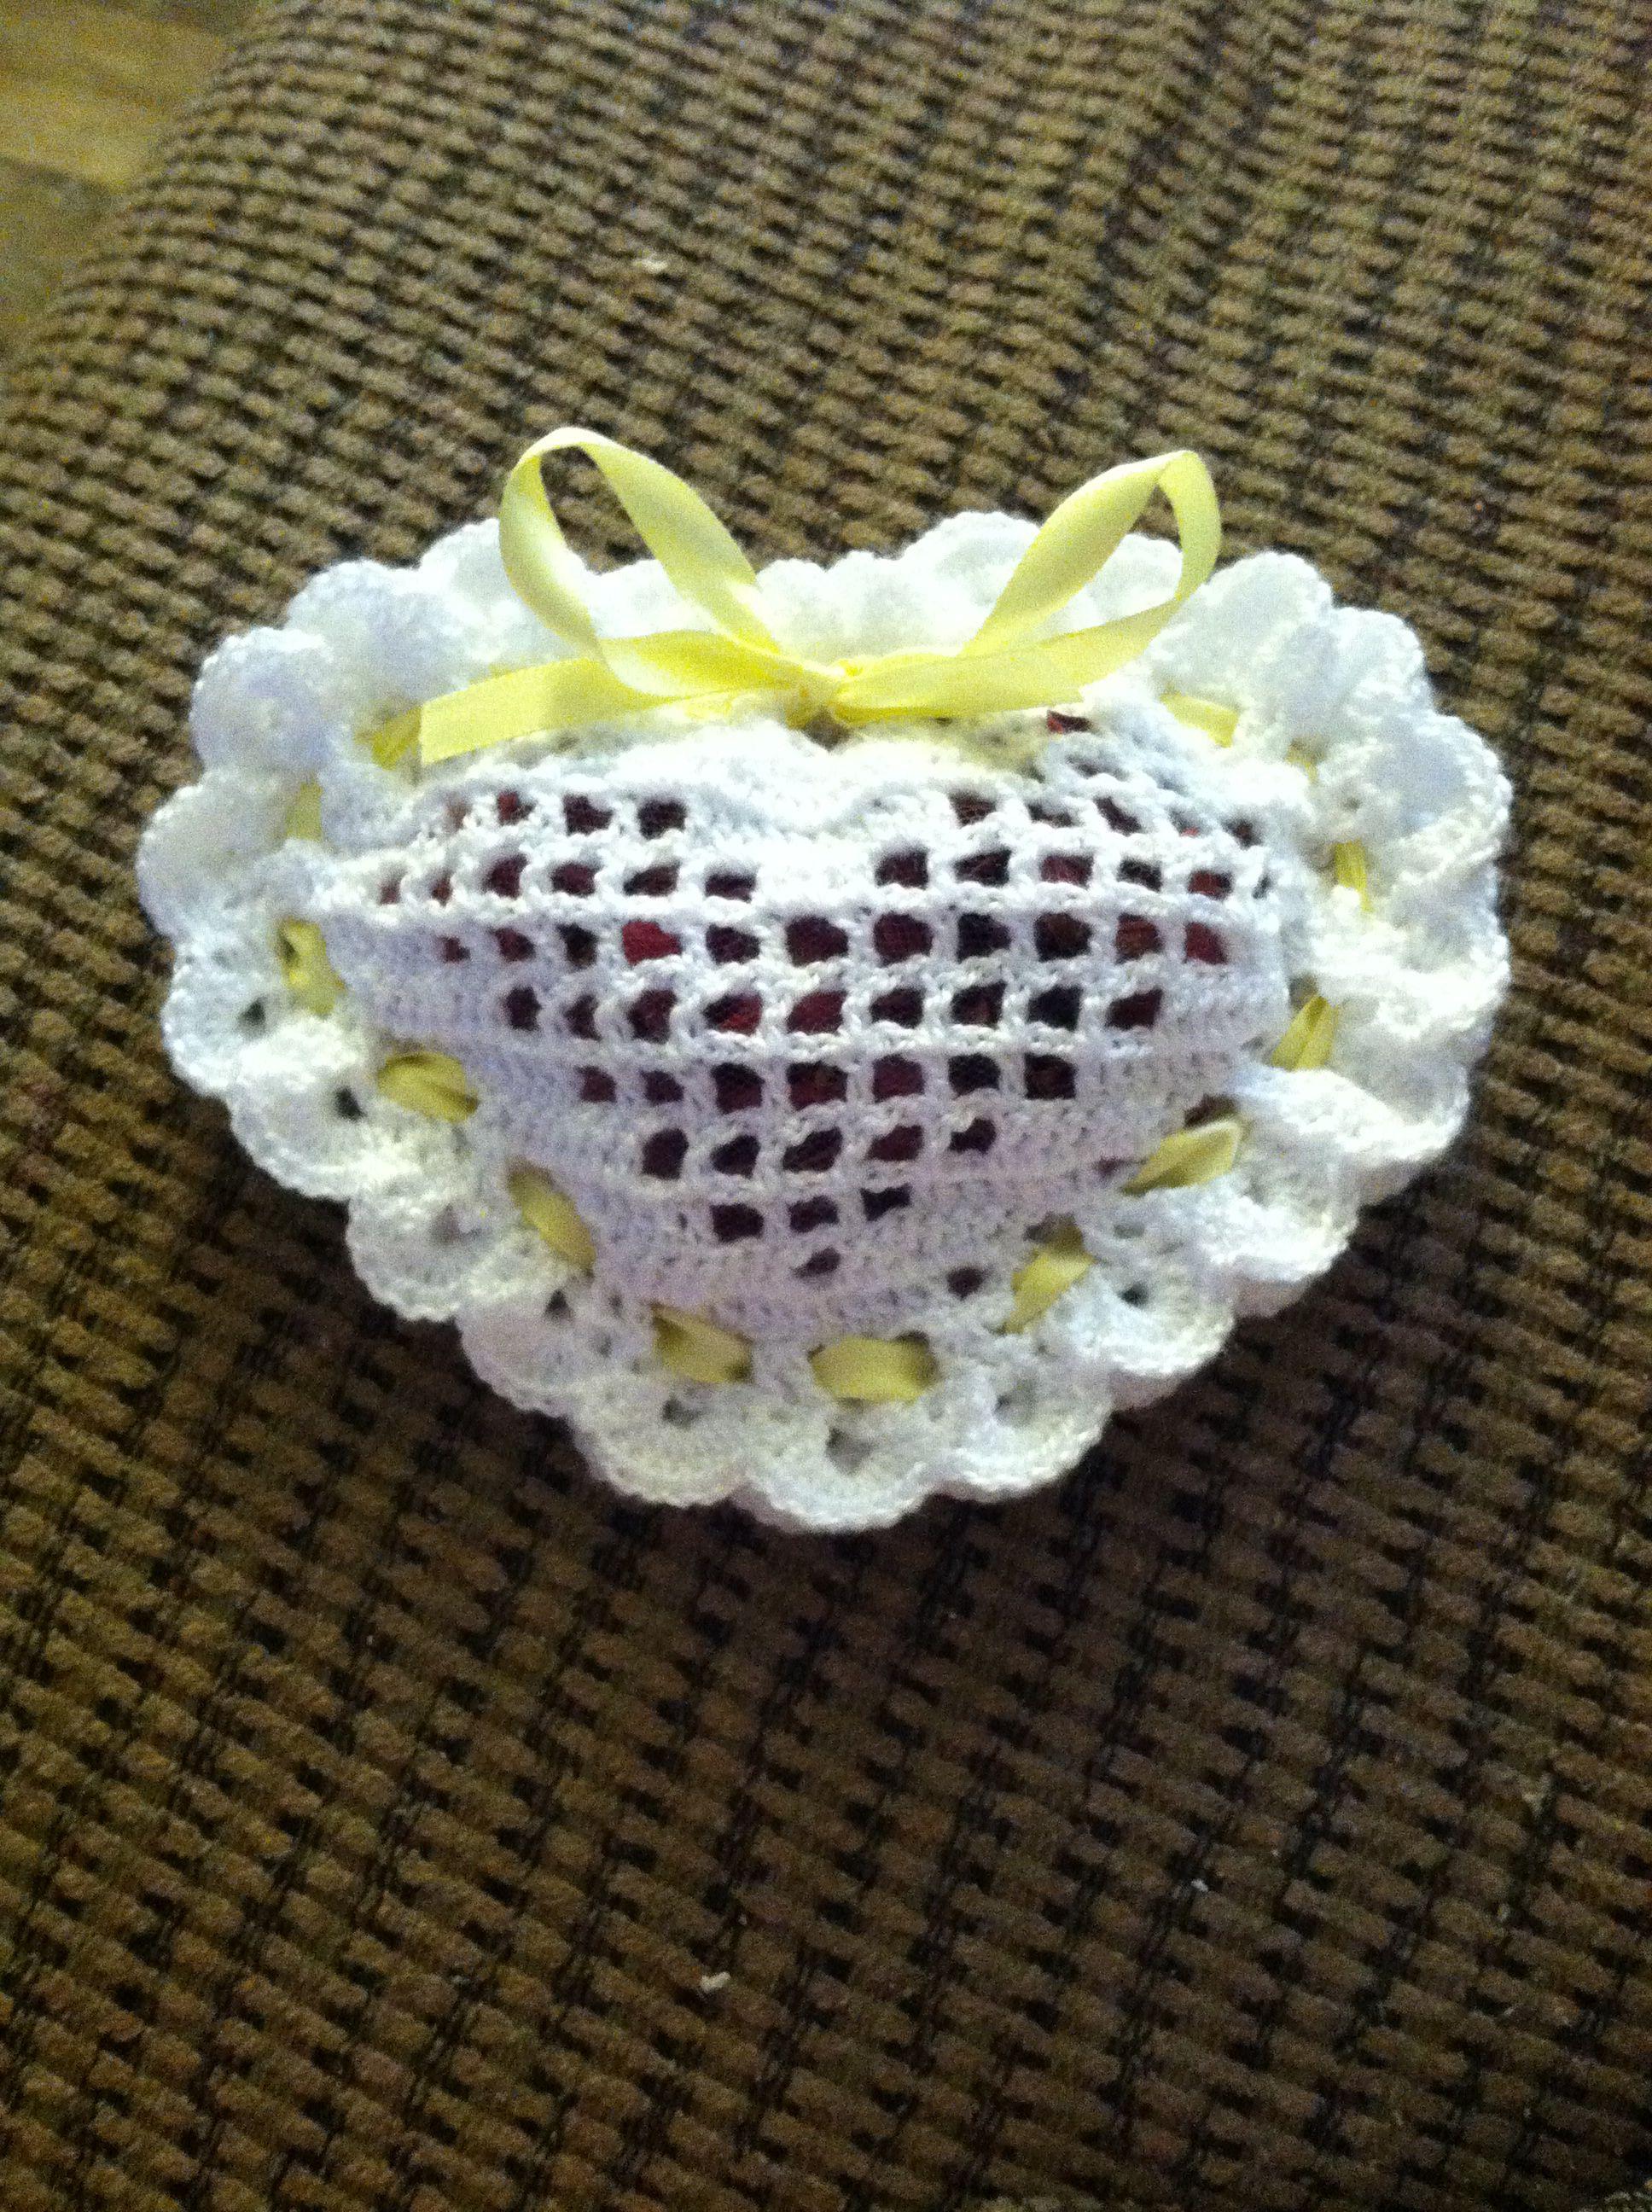 Filet crochet sachet heart w/potpourri | Crochet projects I made ...